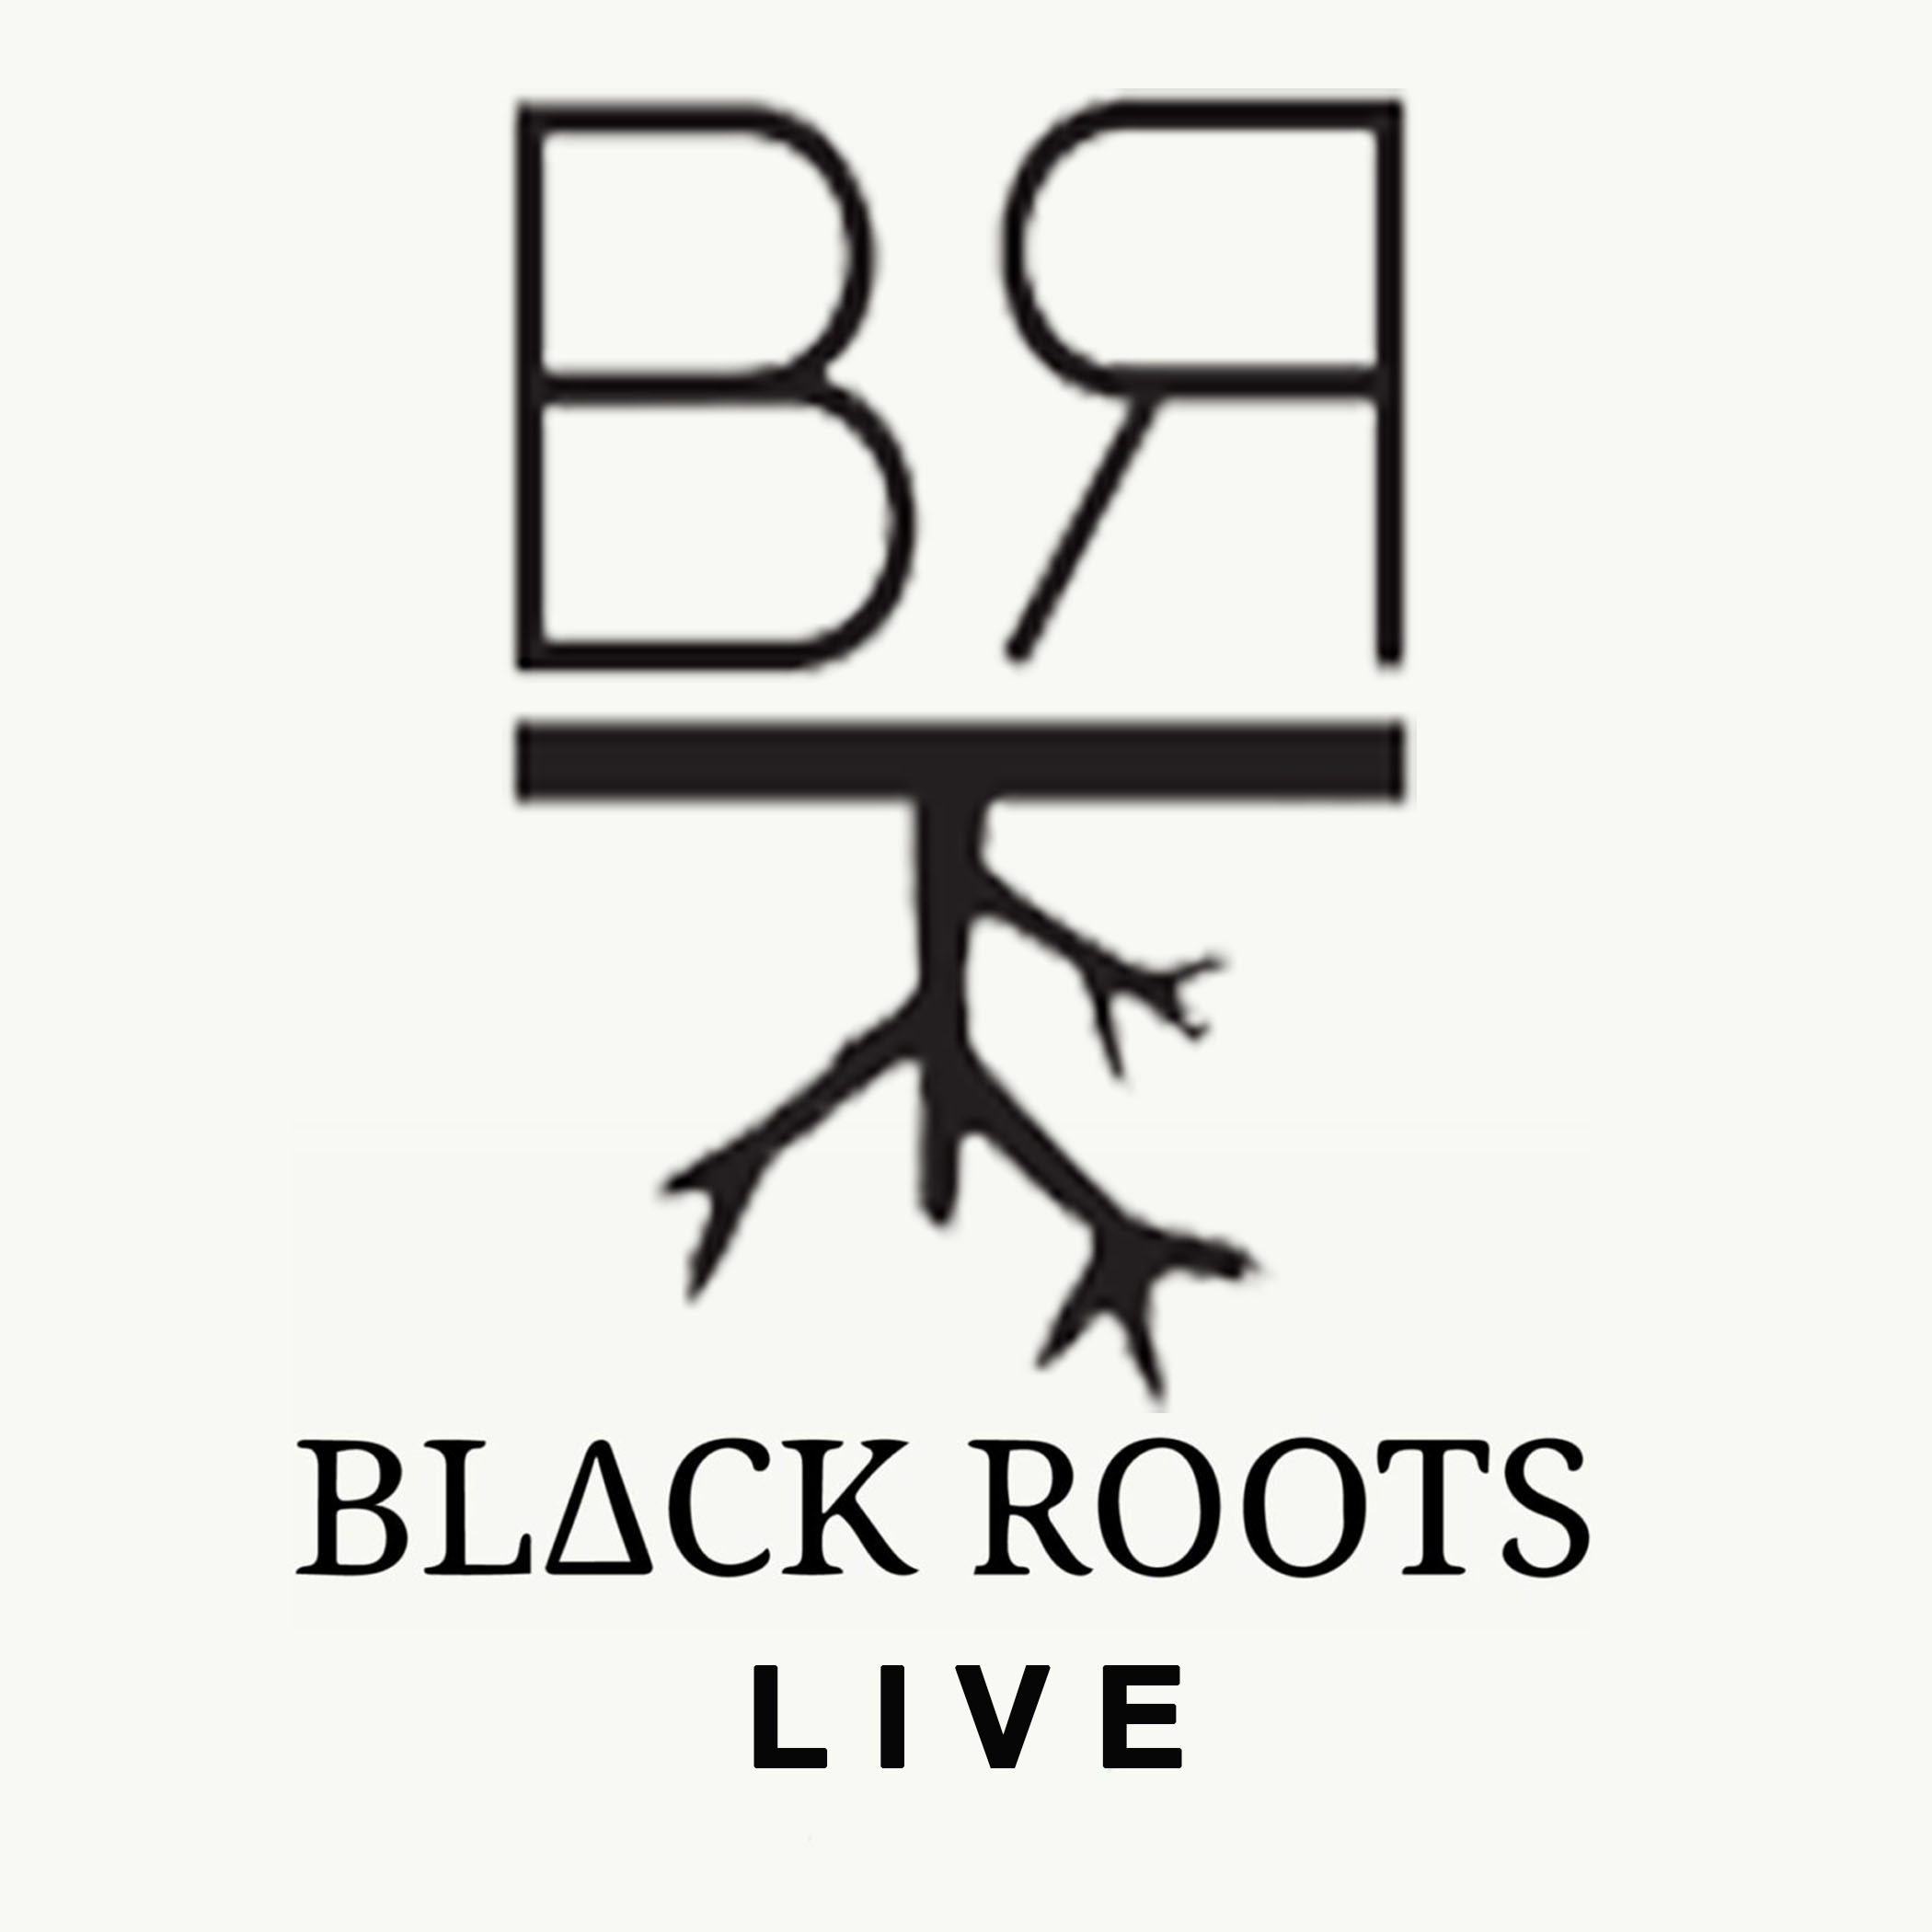 Black Roots Live